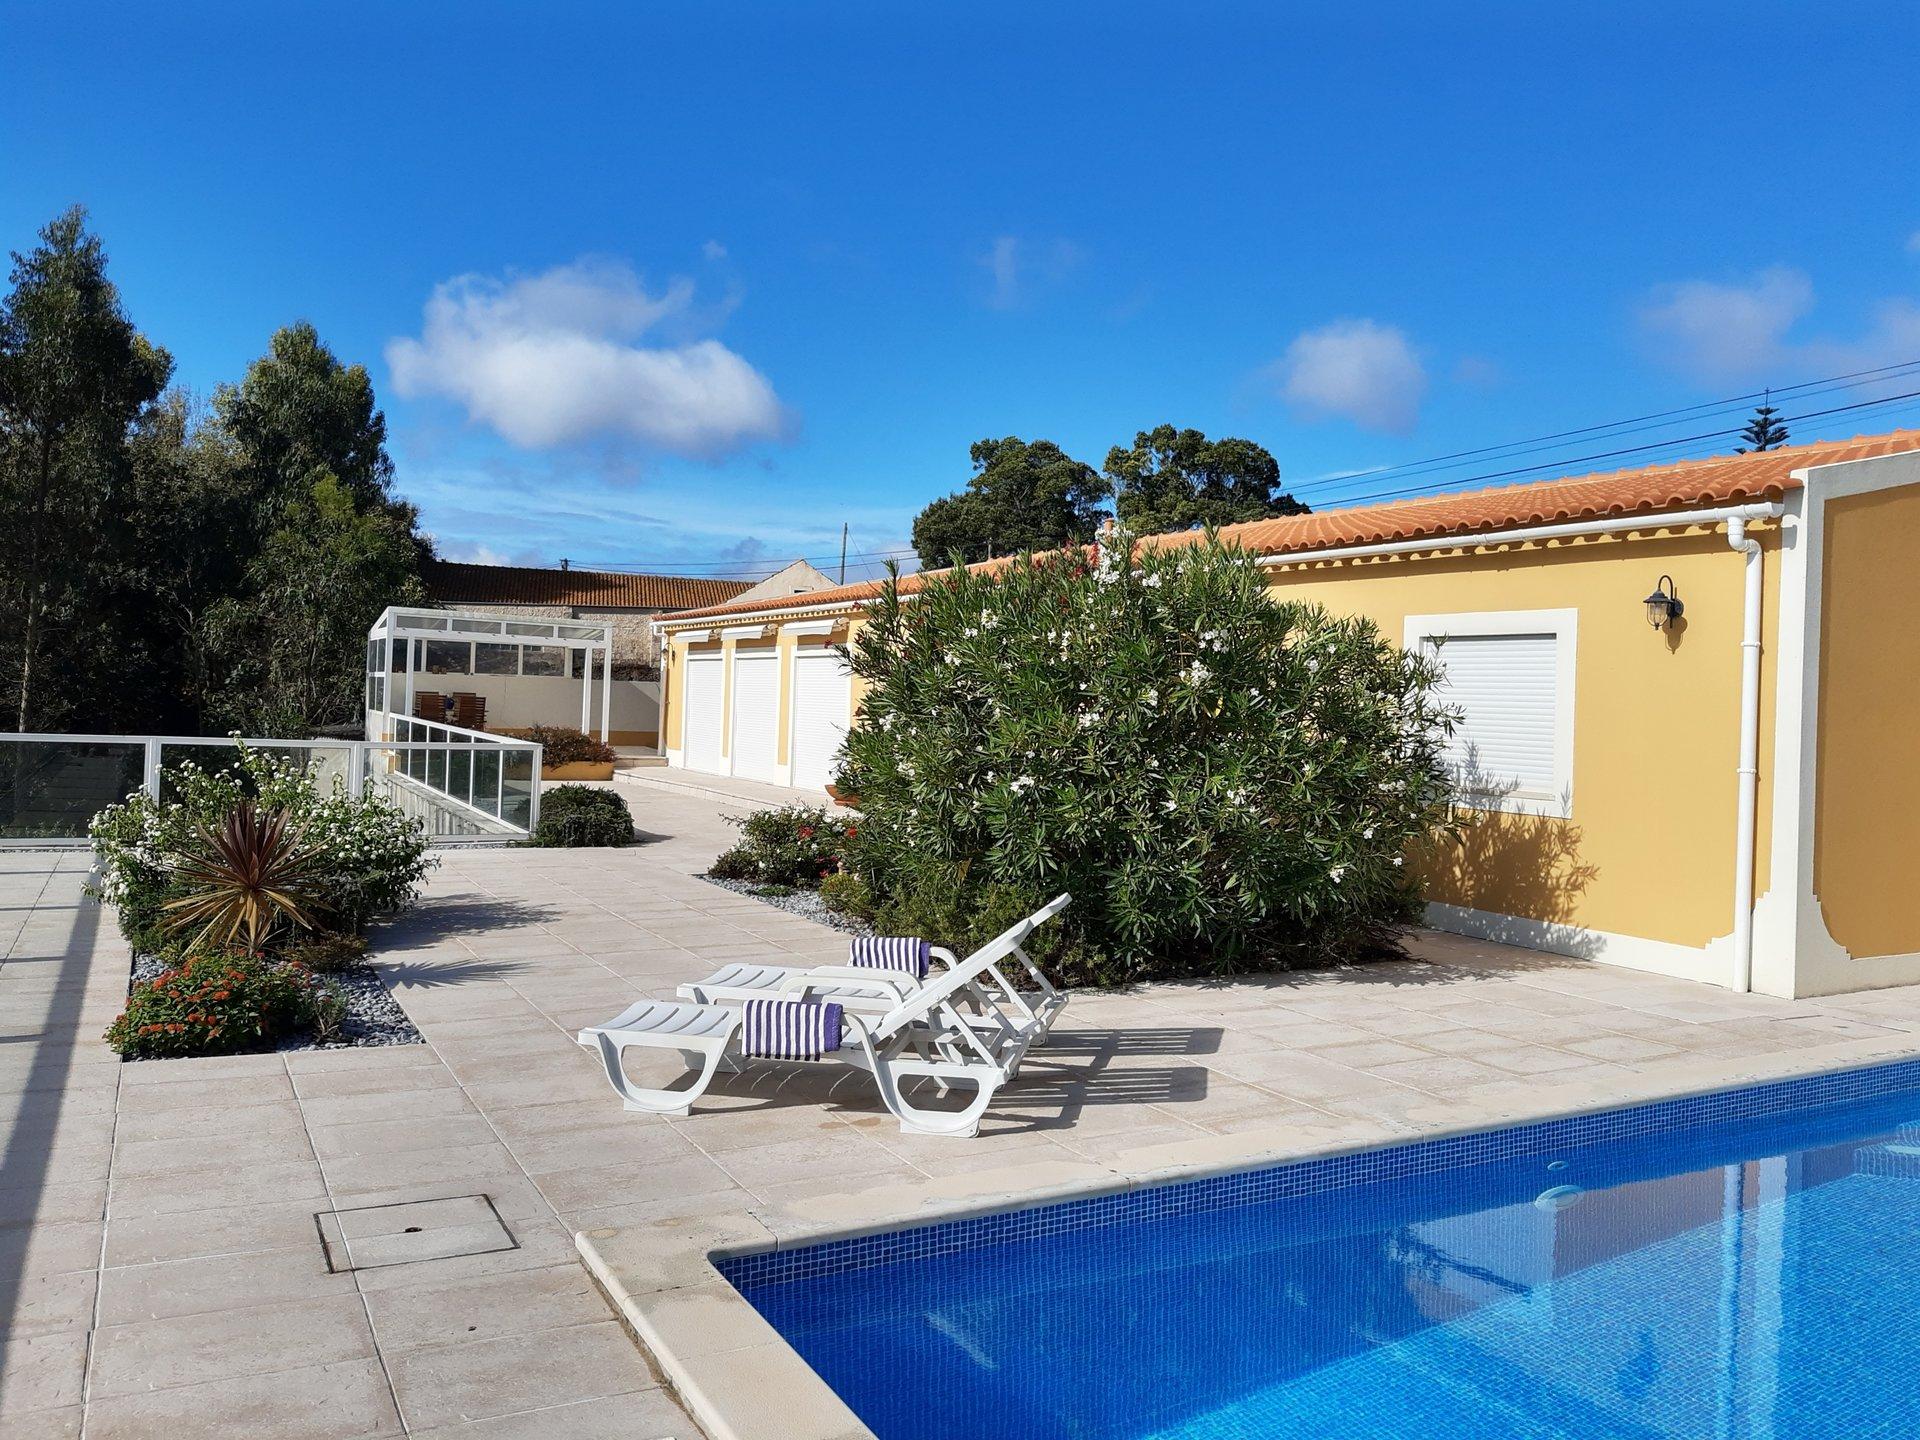 3 Bedroom Villa Alcobaca, Silver Coast Ref: AV2127